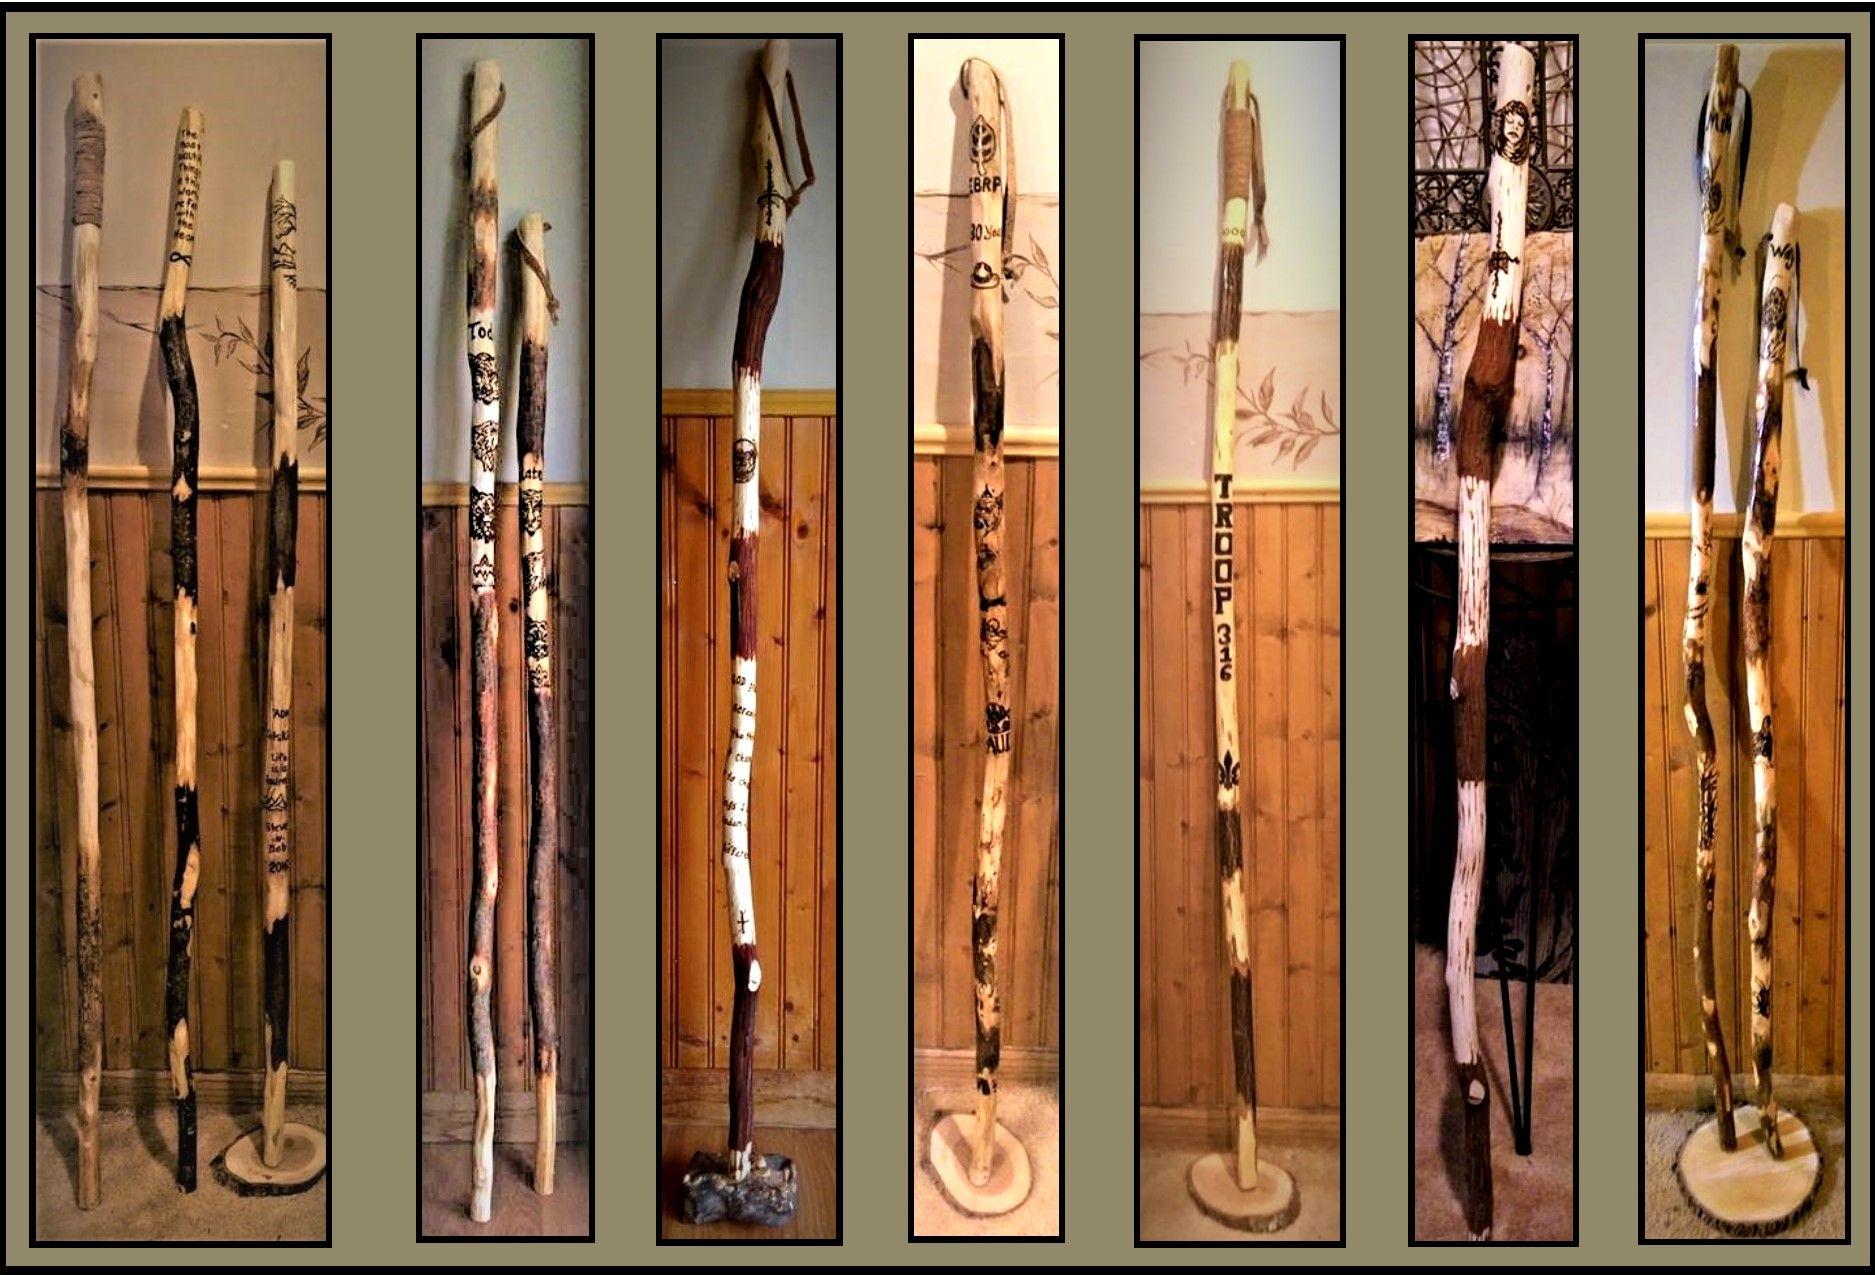 Buy A Custom Made Wood Anniversary Gift Hiking Stick